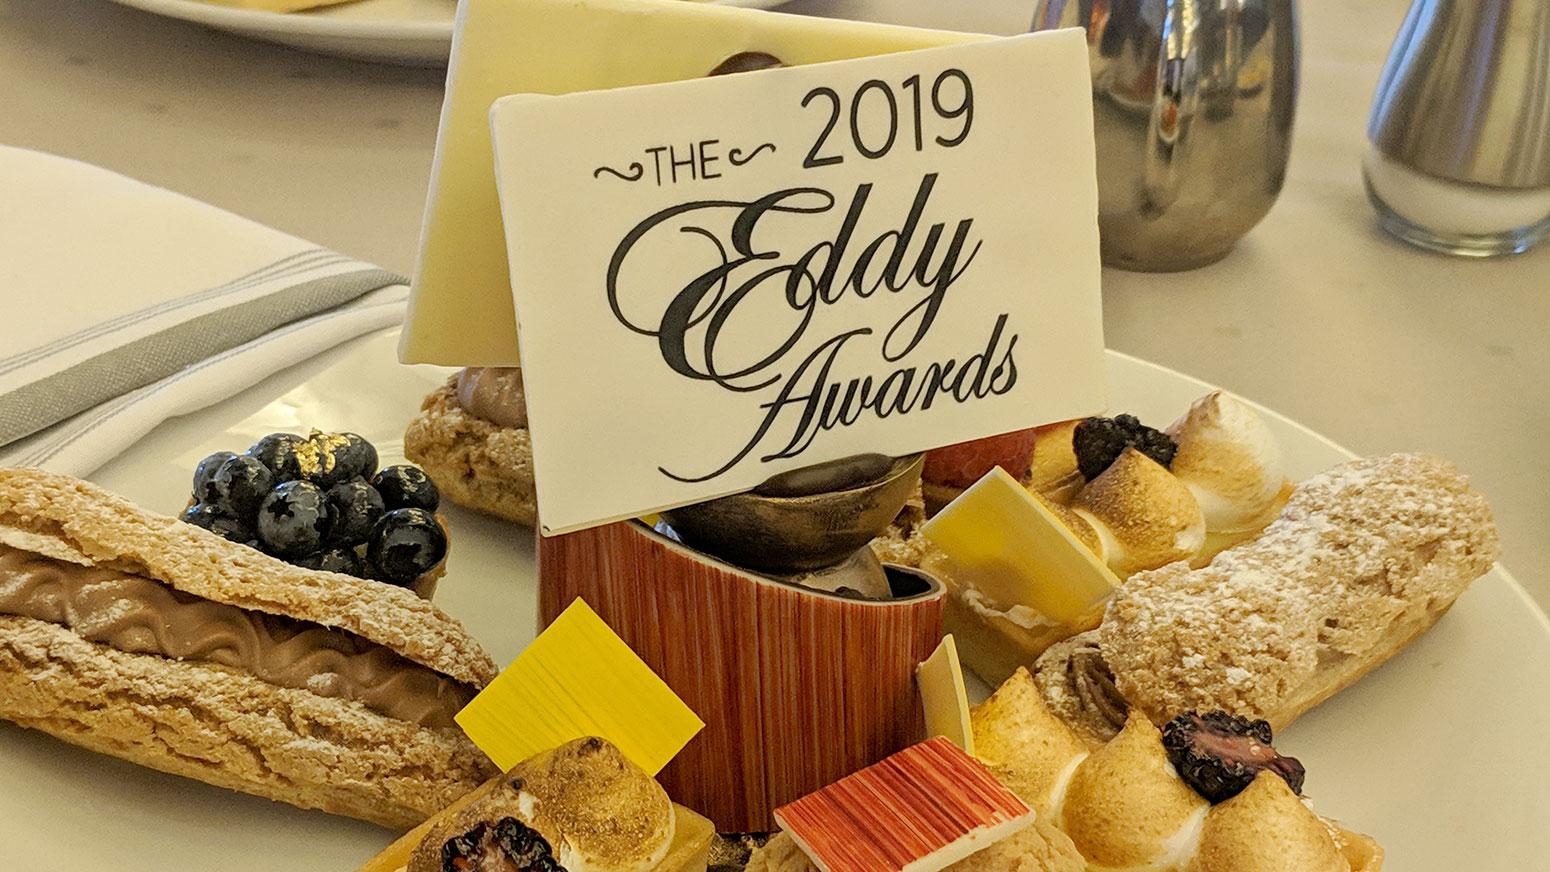 P&I announces 2019 Eddy Award winners